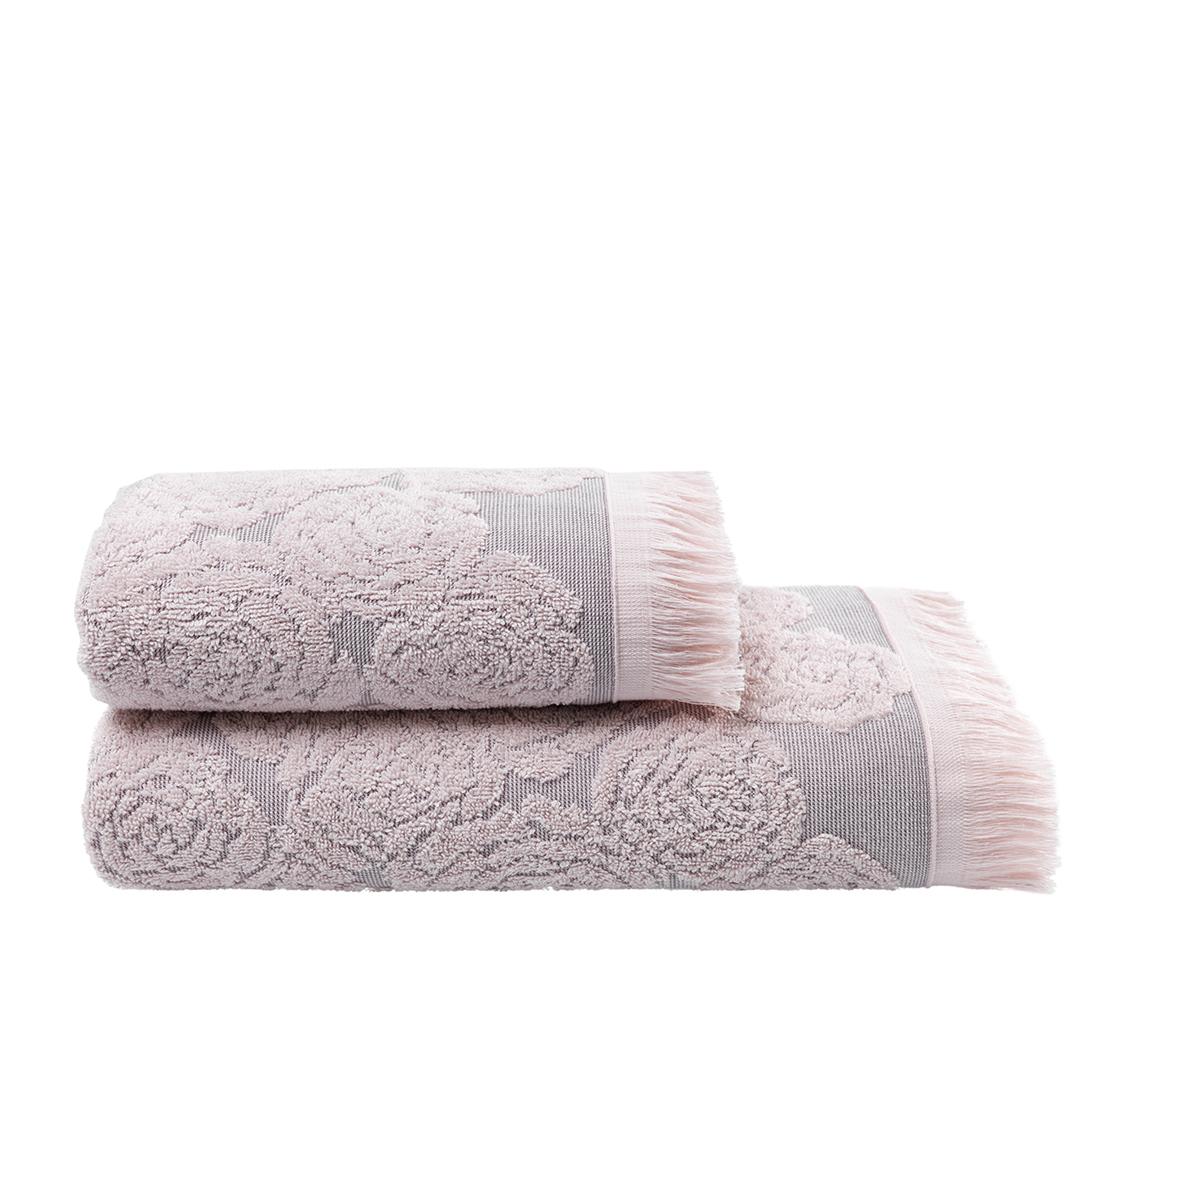 Купить Полотенца Arya, Полотенце Nadine Цвет: Розовый (50х90 см), Турция, Жаккард